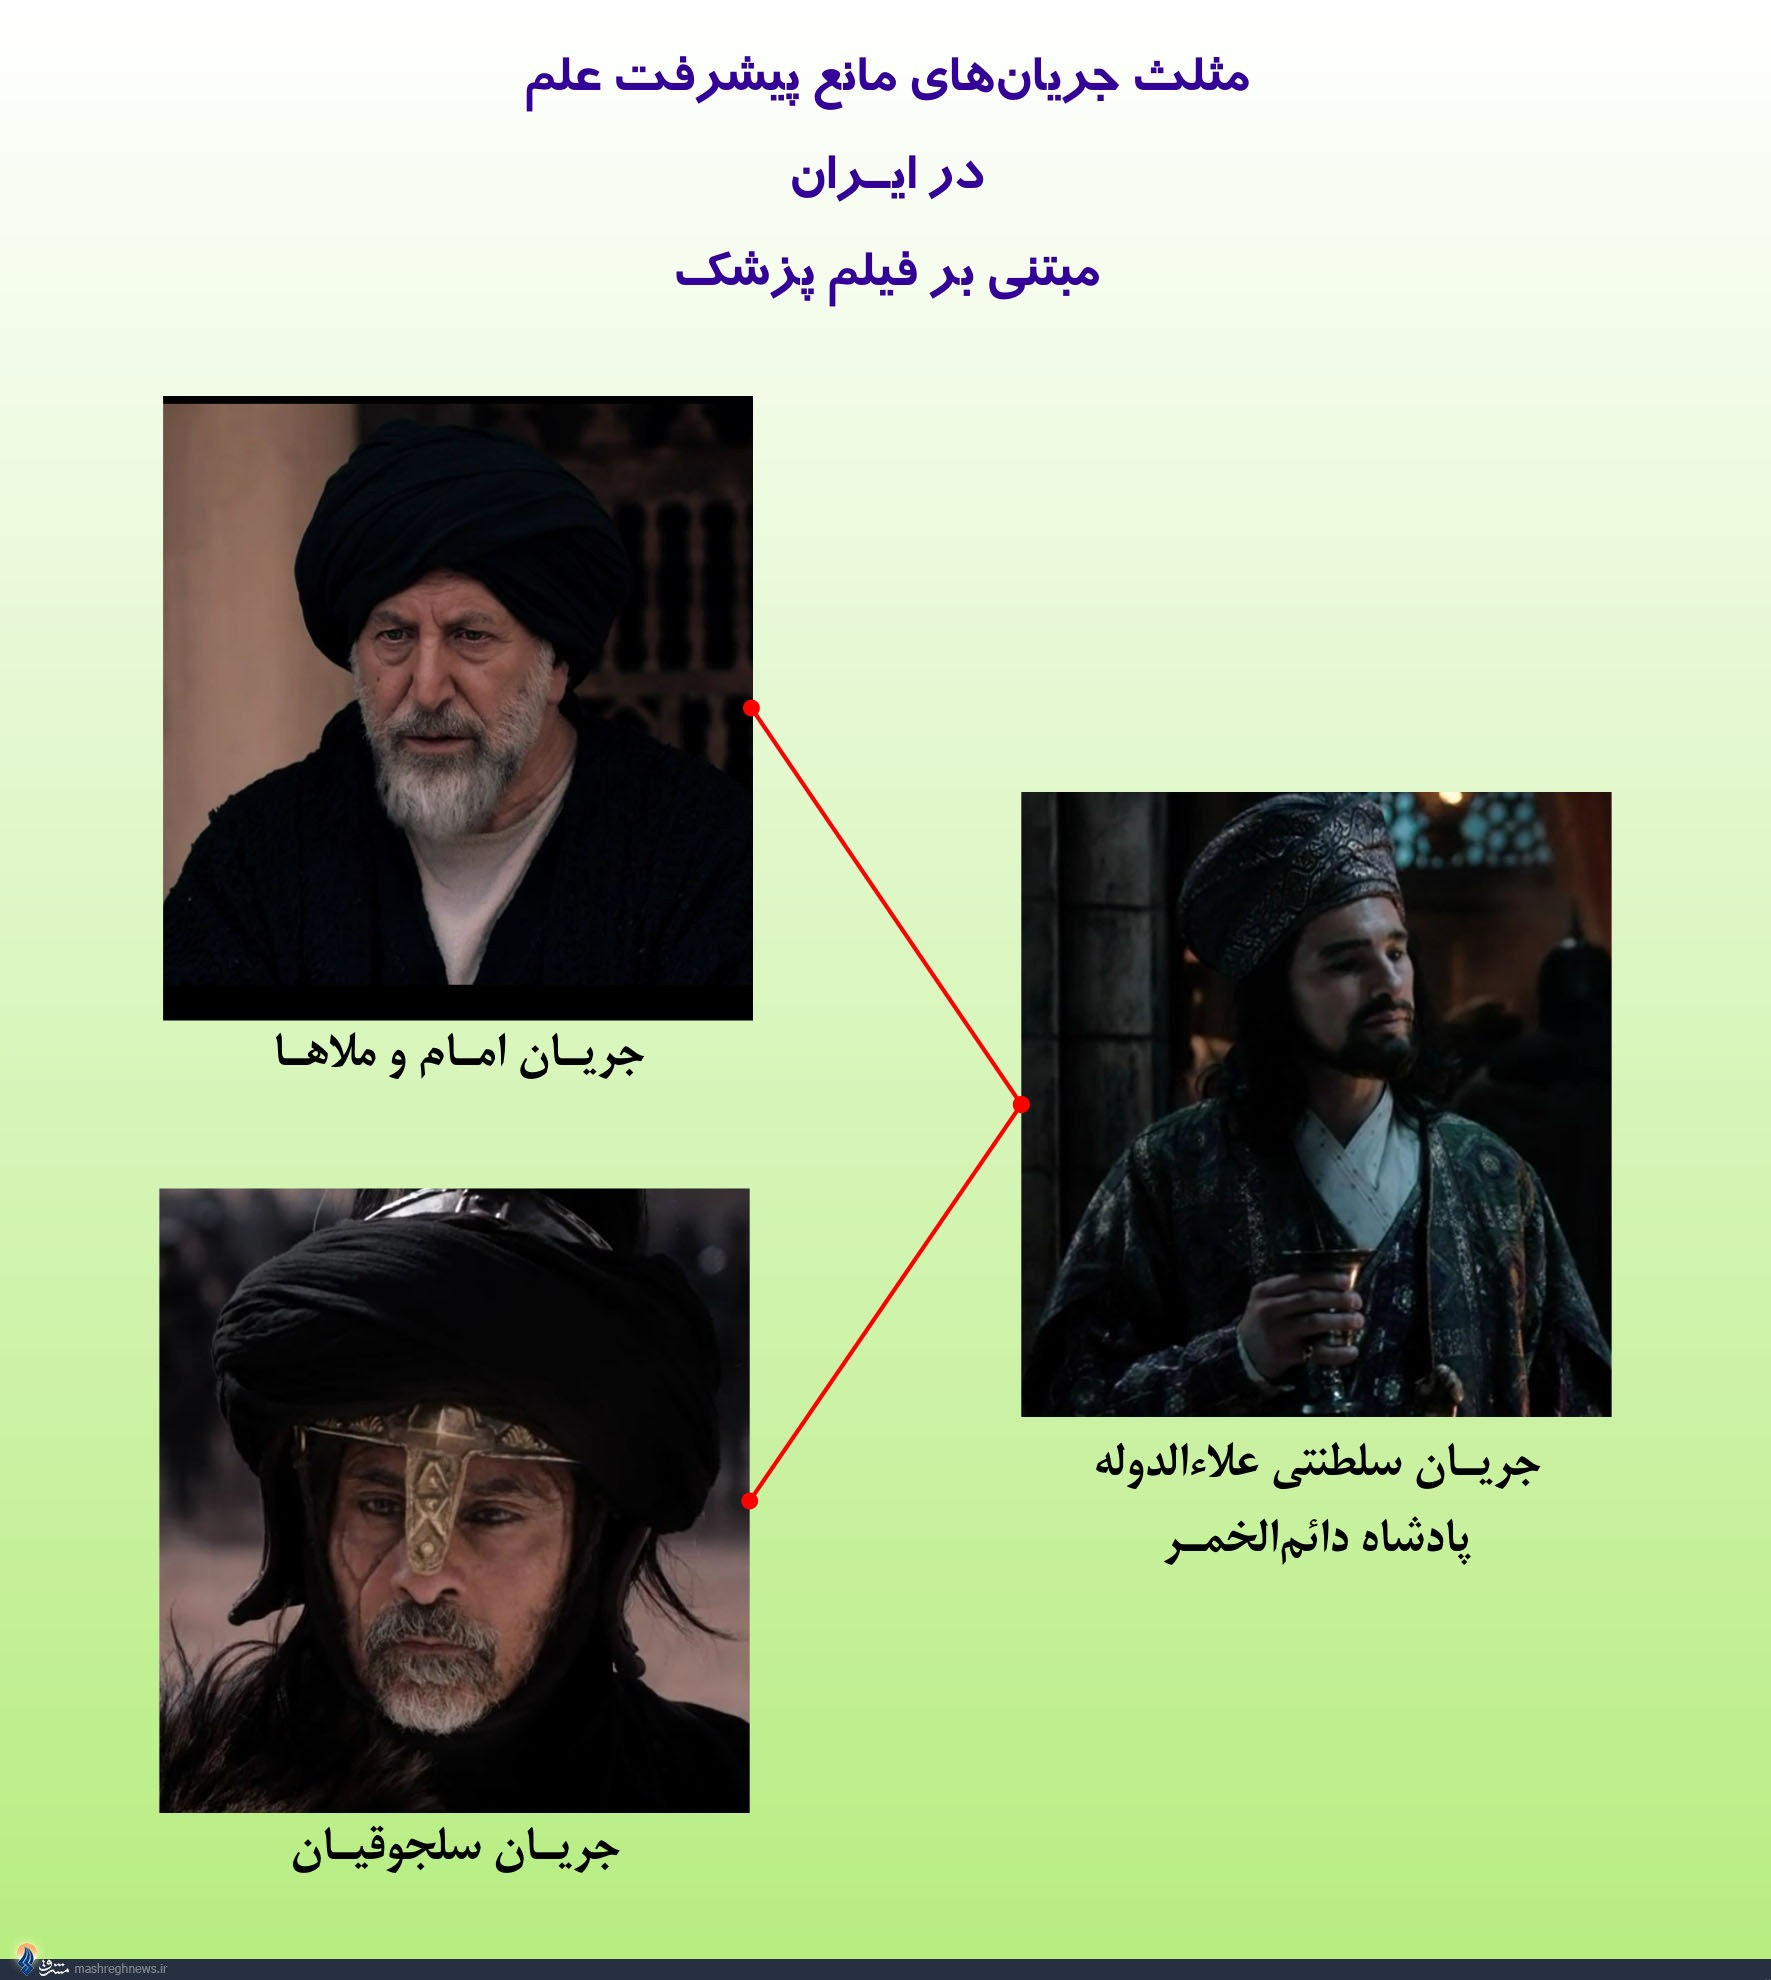 http://buali.ir/buali_content/media/image/2016/09/1414_orig.jpg